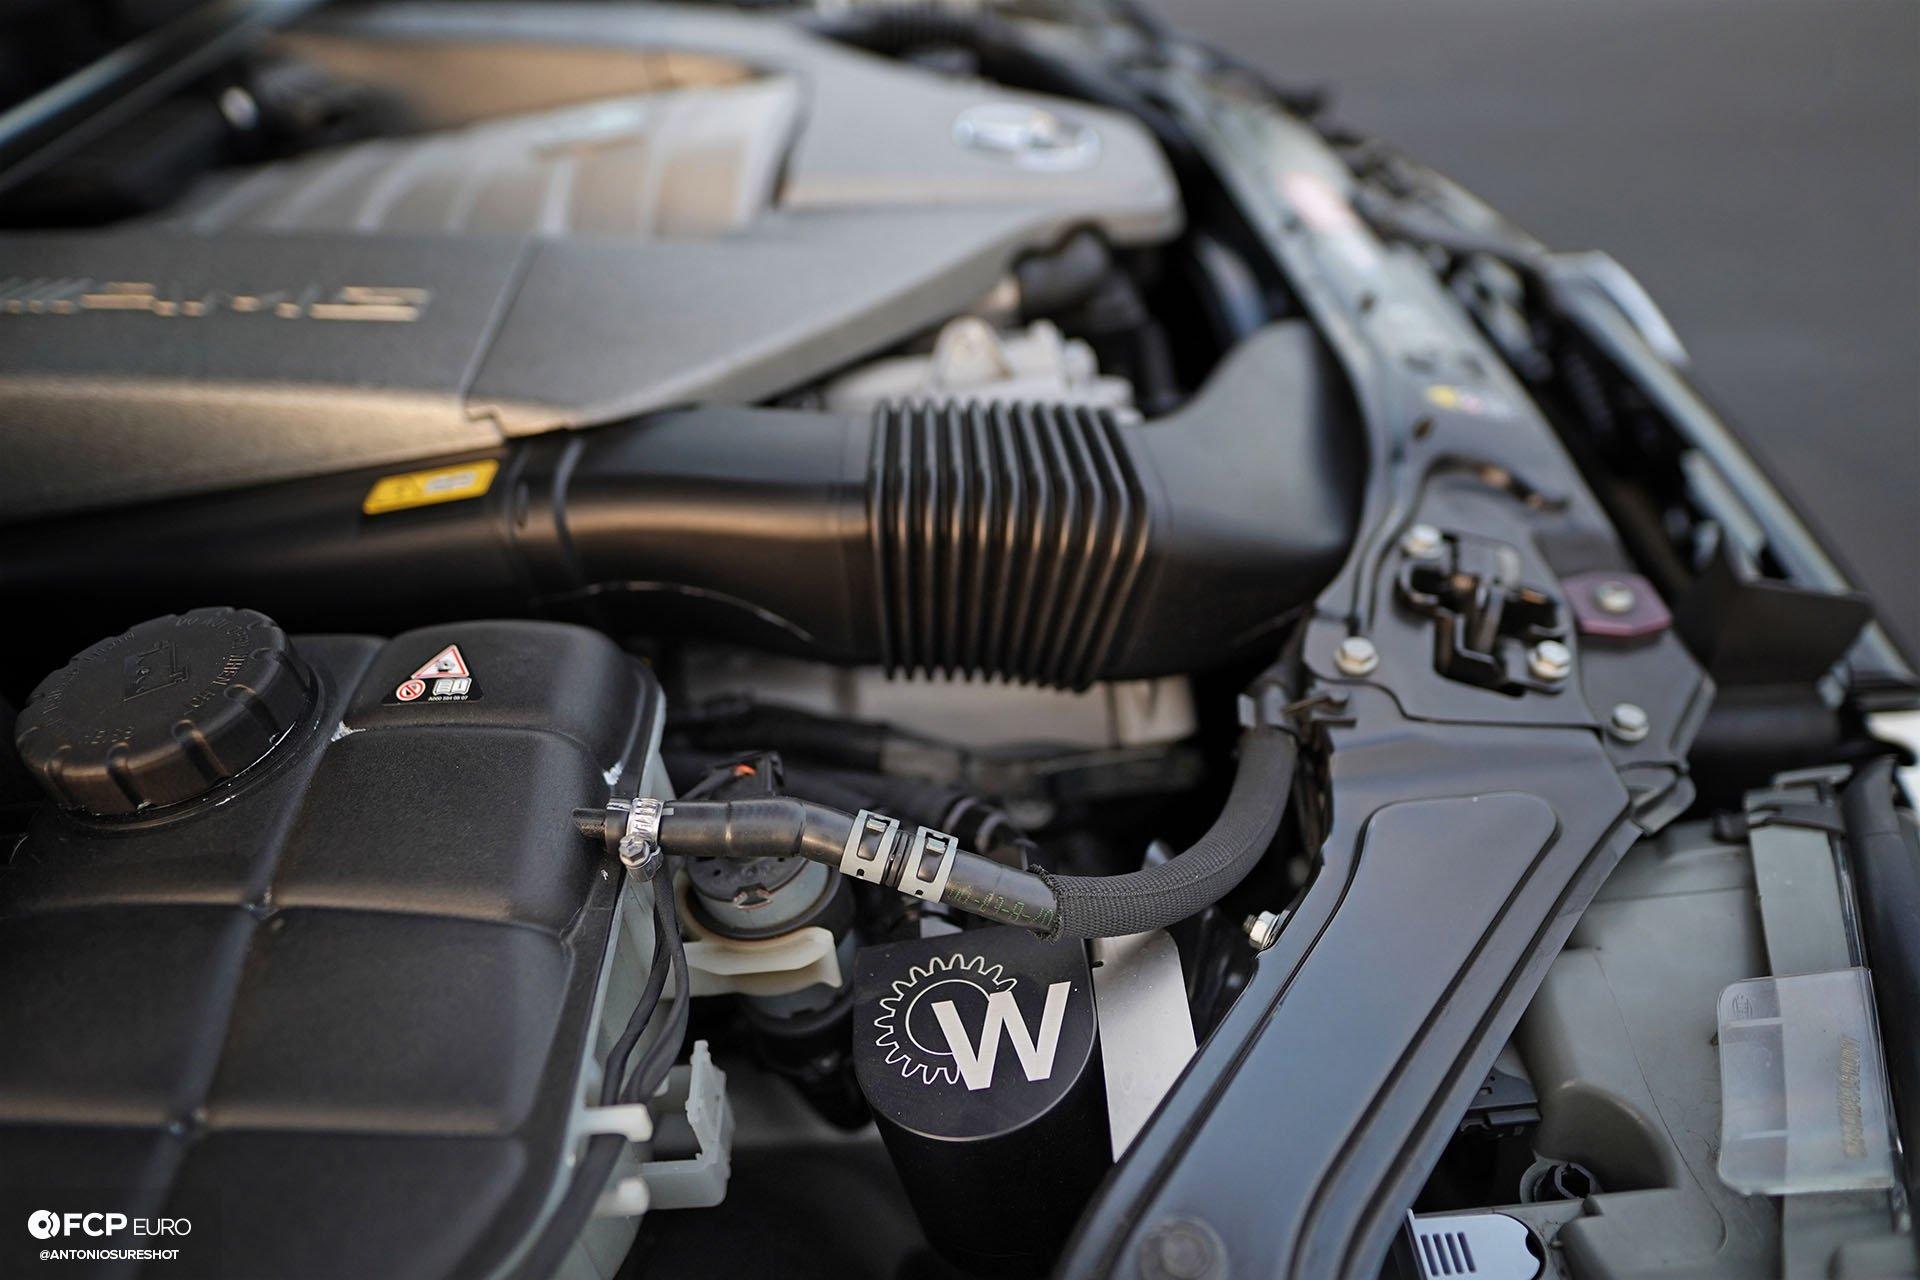 Mercedes Benz AMG CLK63 Black Series M156 Weistec